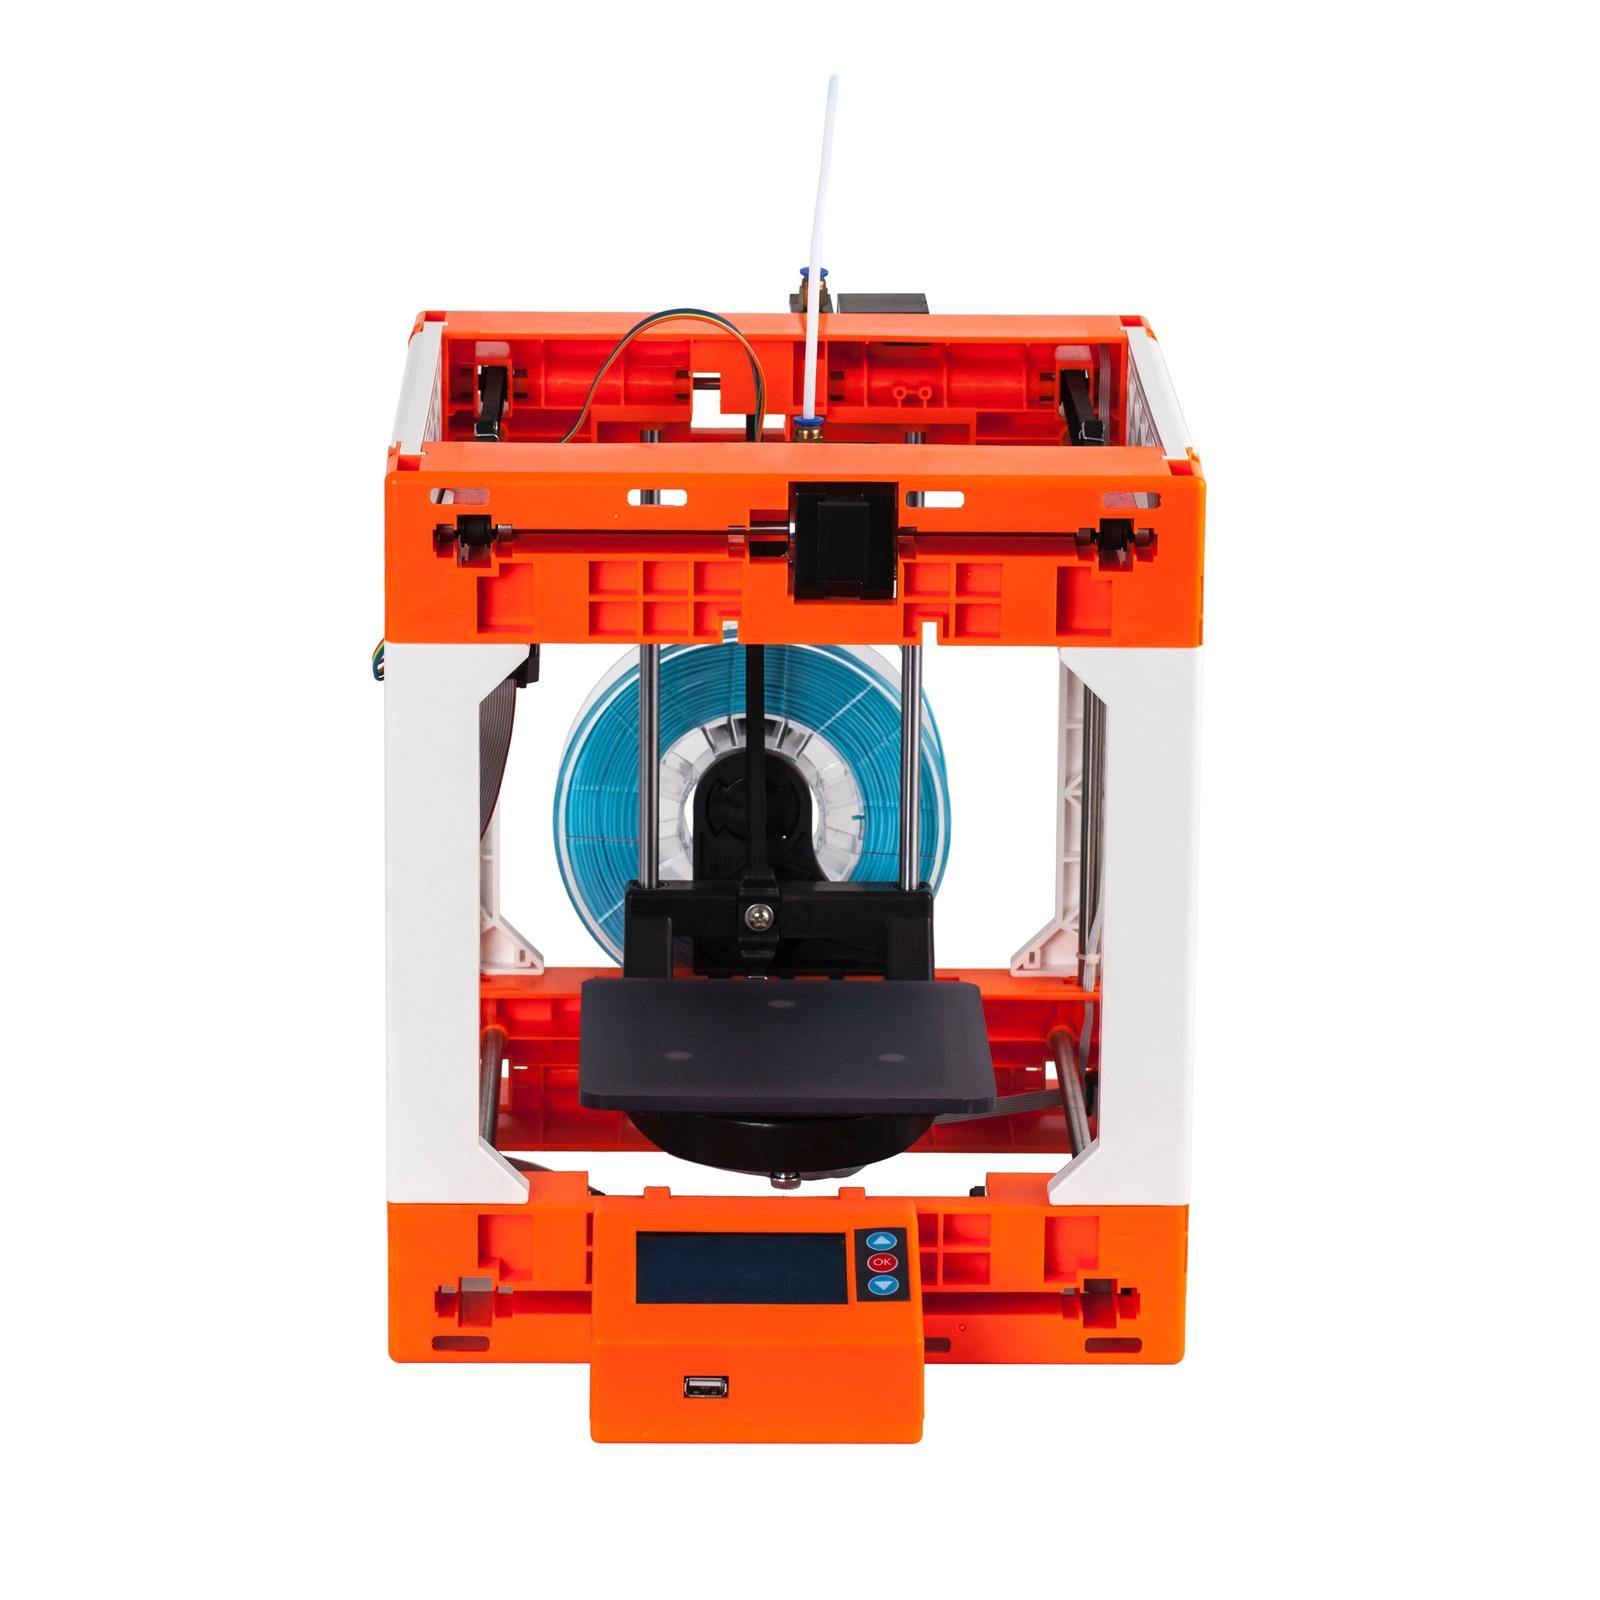 3Dпринтер Funtastique EVO (оранжевый) FUNTASTIQUE